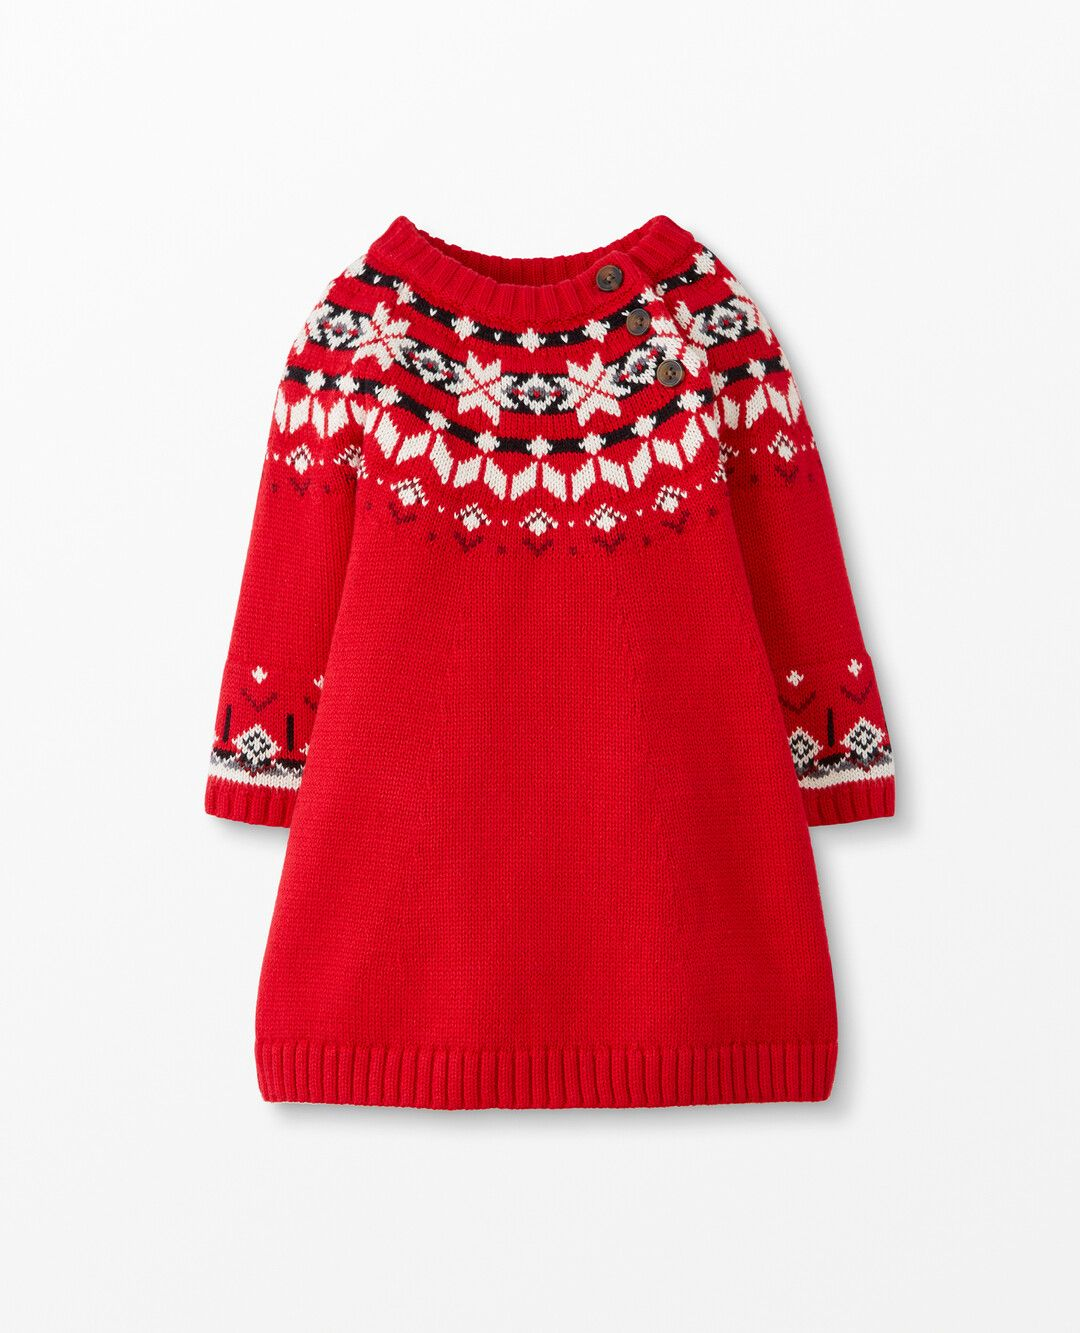 Snö Happy Sweater Dress Sweater dress, Cozy dress, Girls